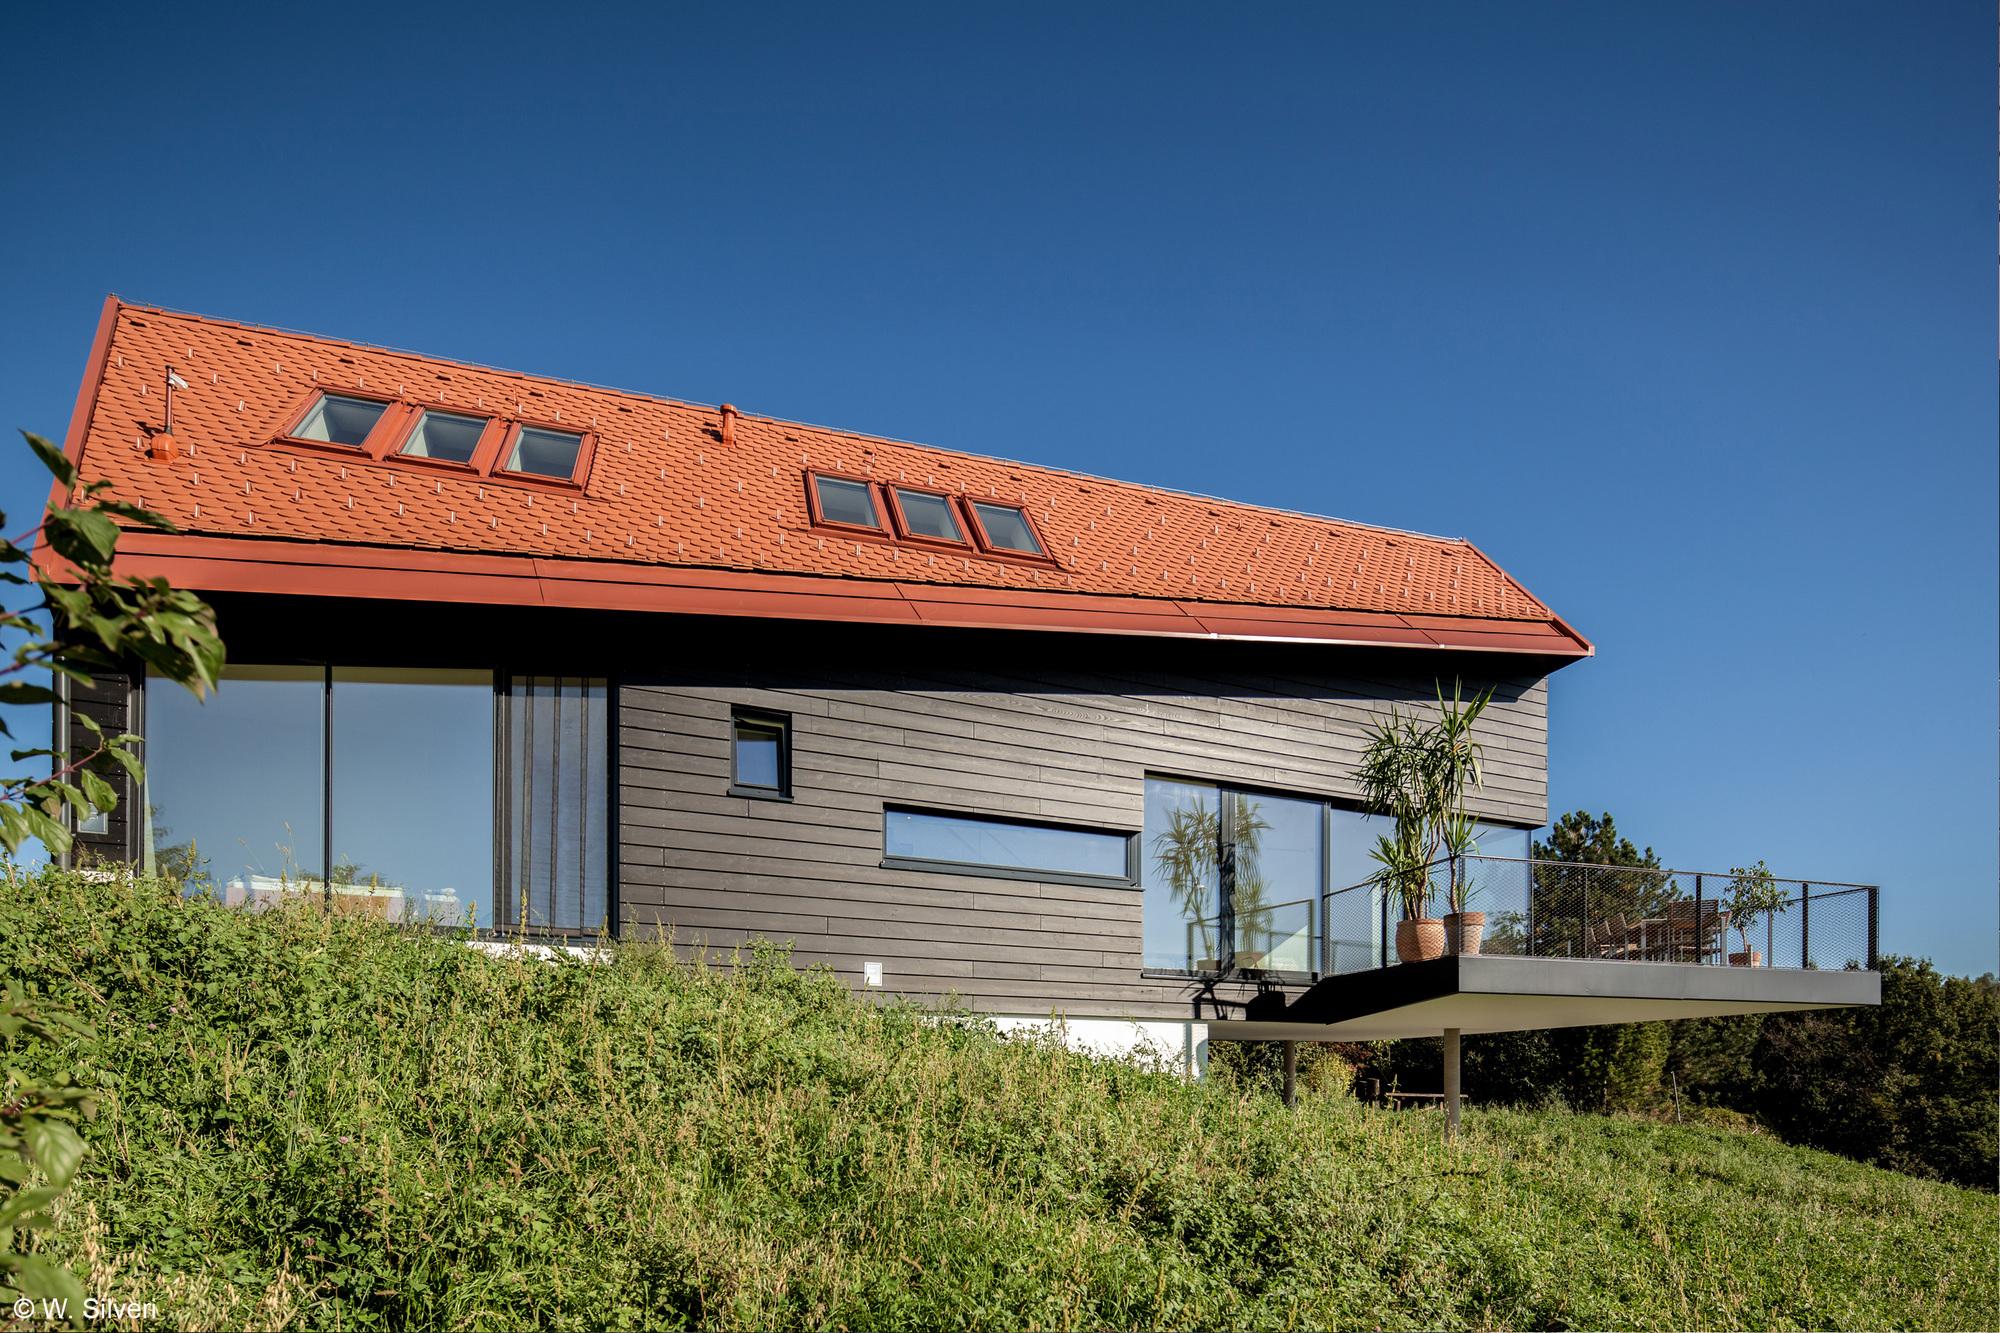 architecture photography haus am steinberg hog architektur 325865. Black Bedroom Furniture Sets. Home Design Ideas